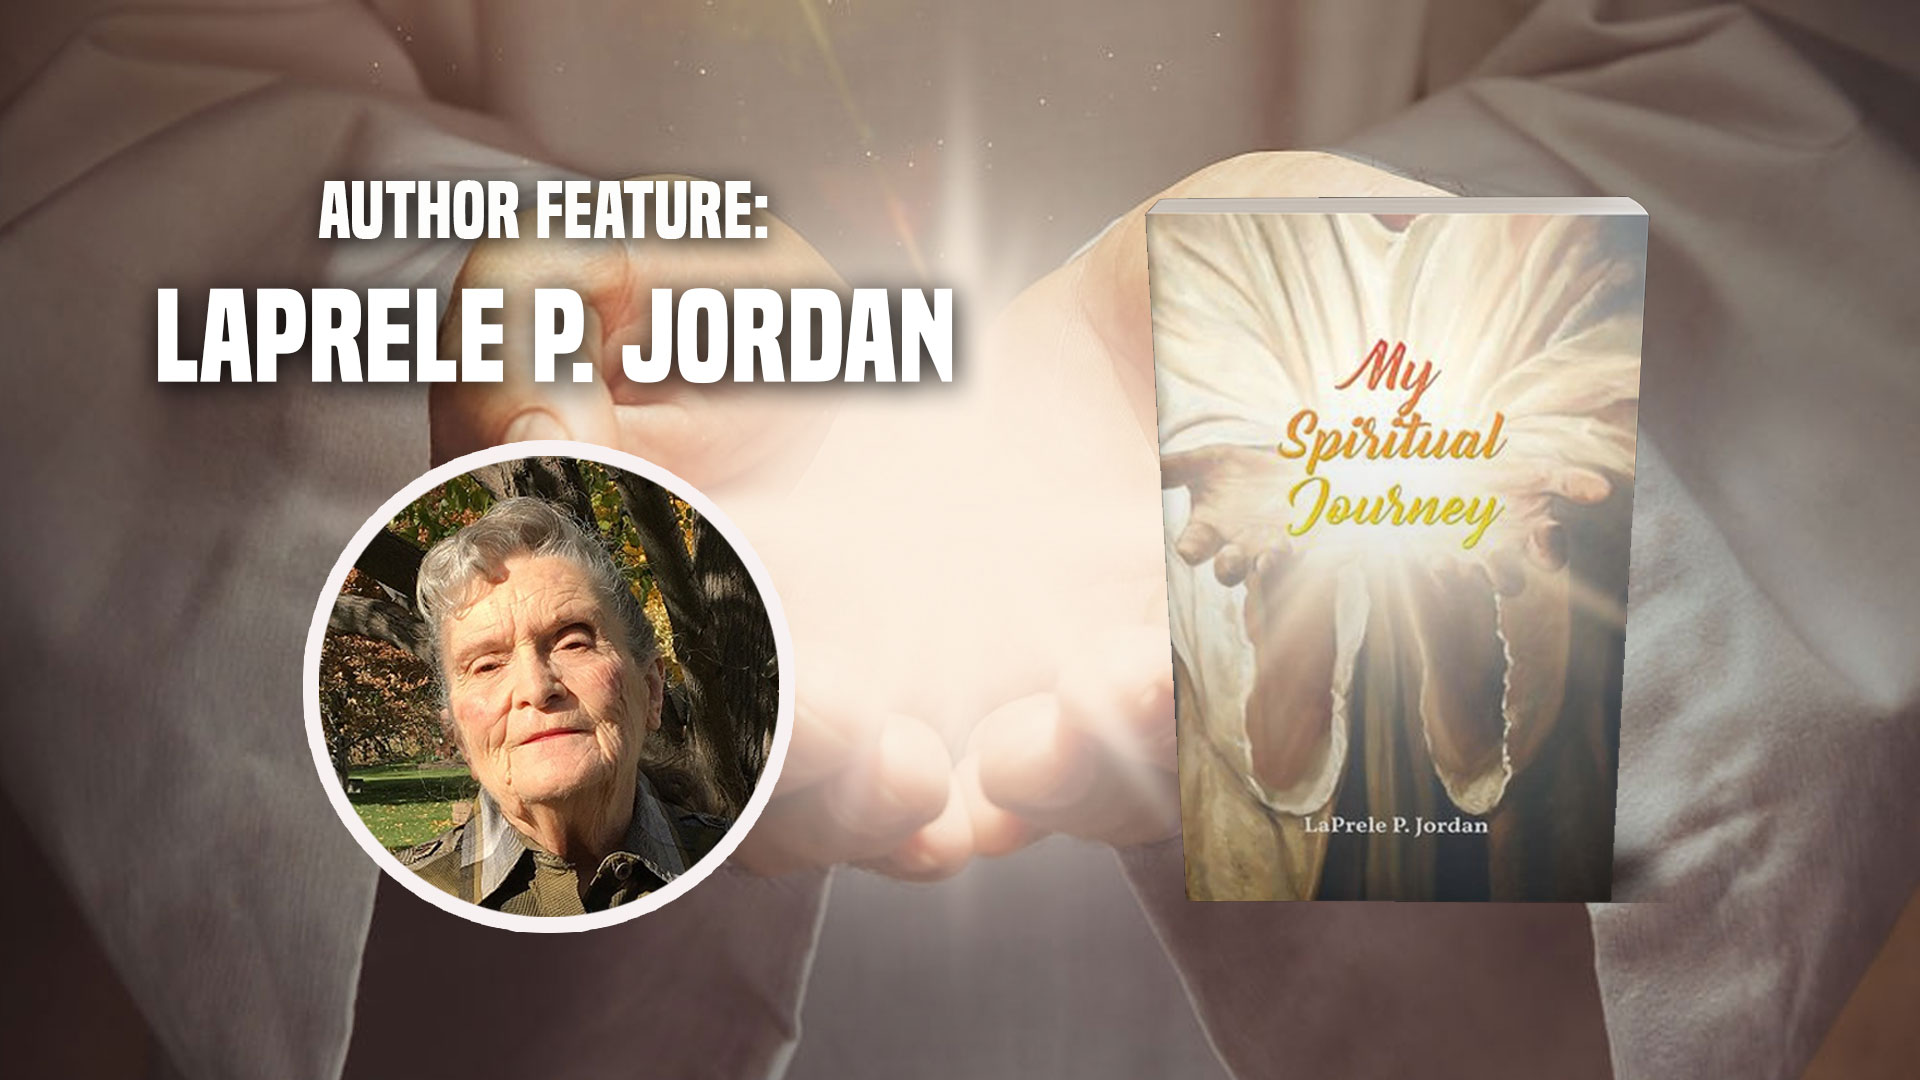 Author-Feature-LaPrele-P.-Jordan banner